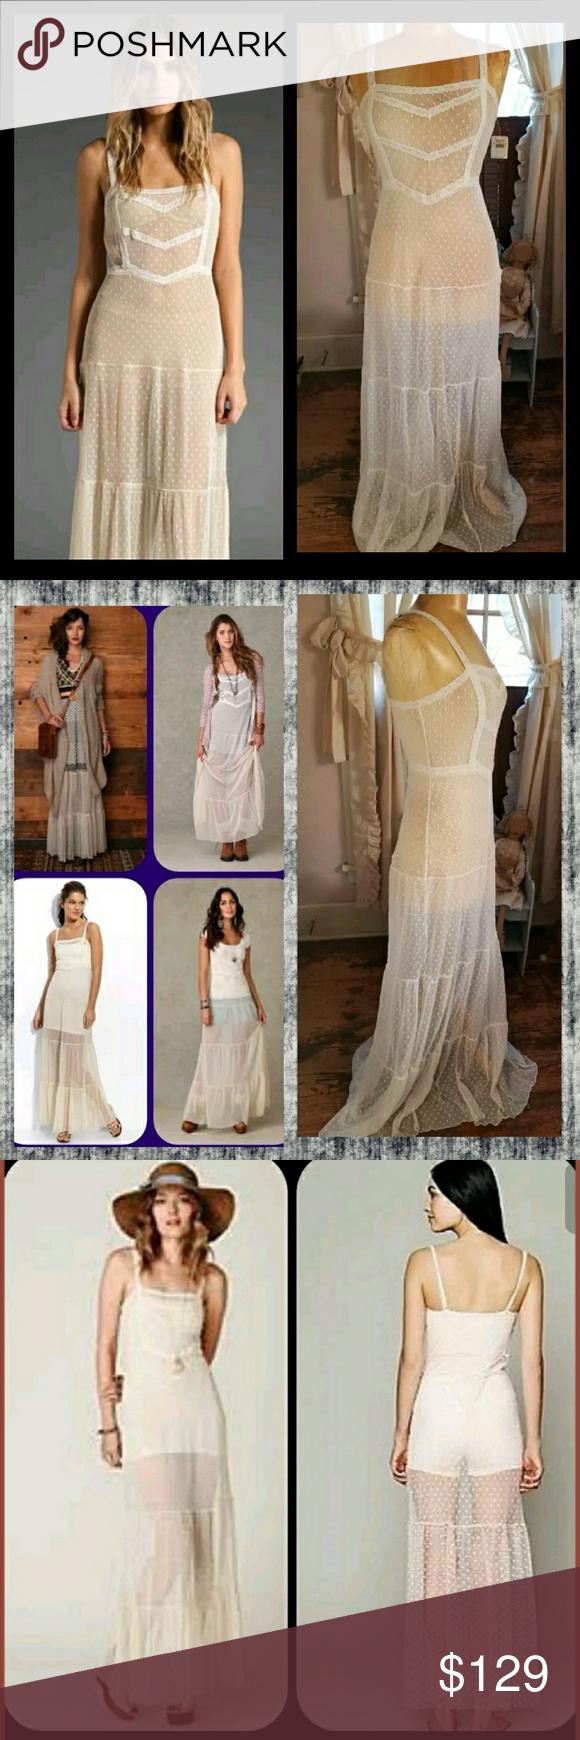 Free people swiss dot mesh lace tiered maxi dress nwt chunky